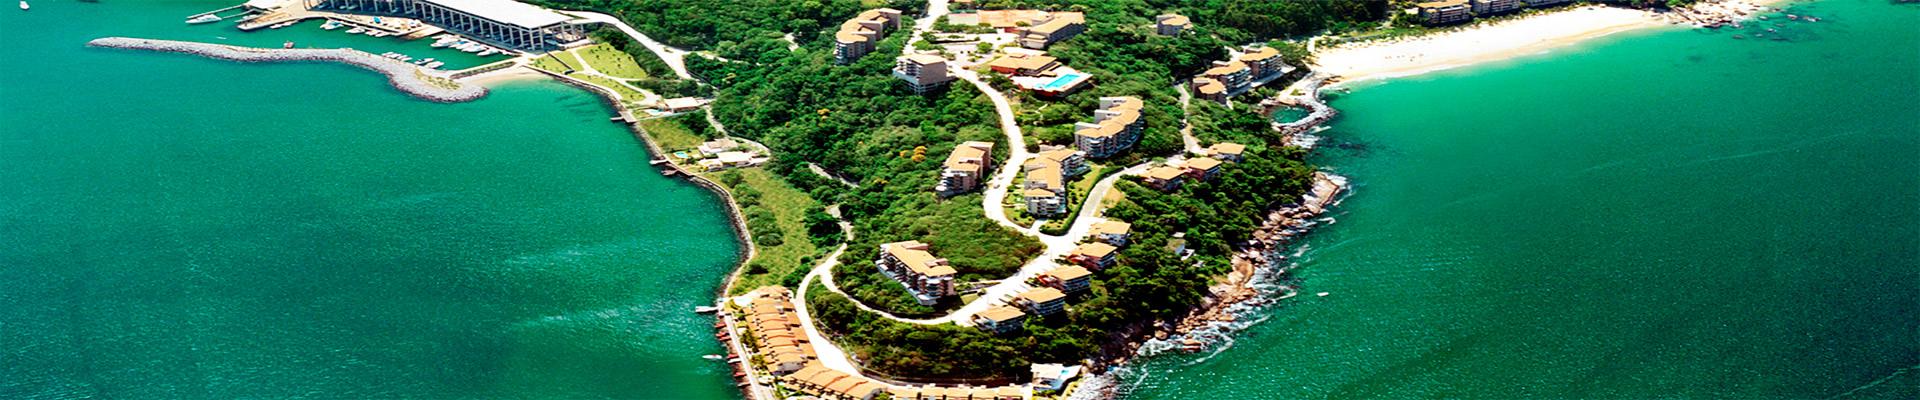 Hotel Porto Real – Angra dos Reis